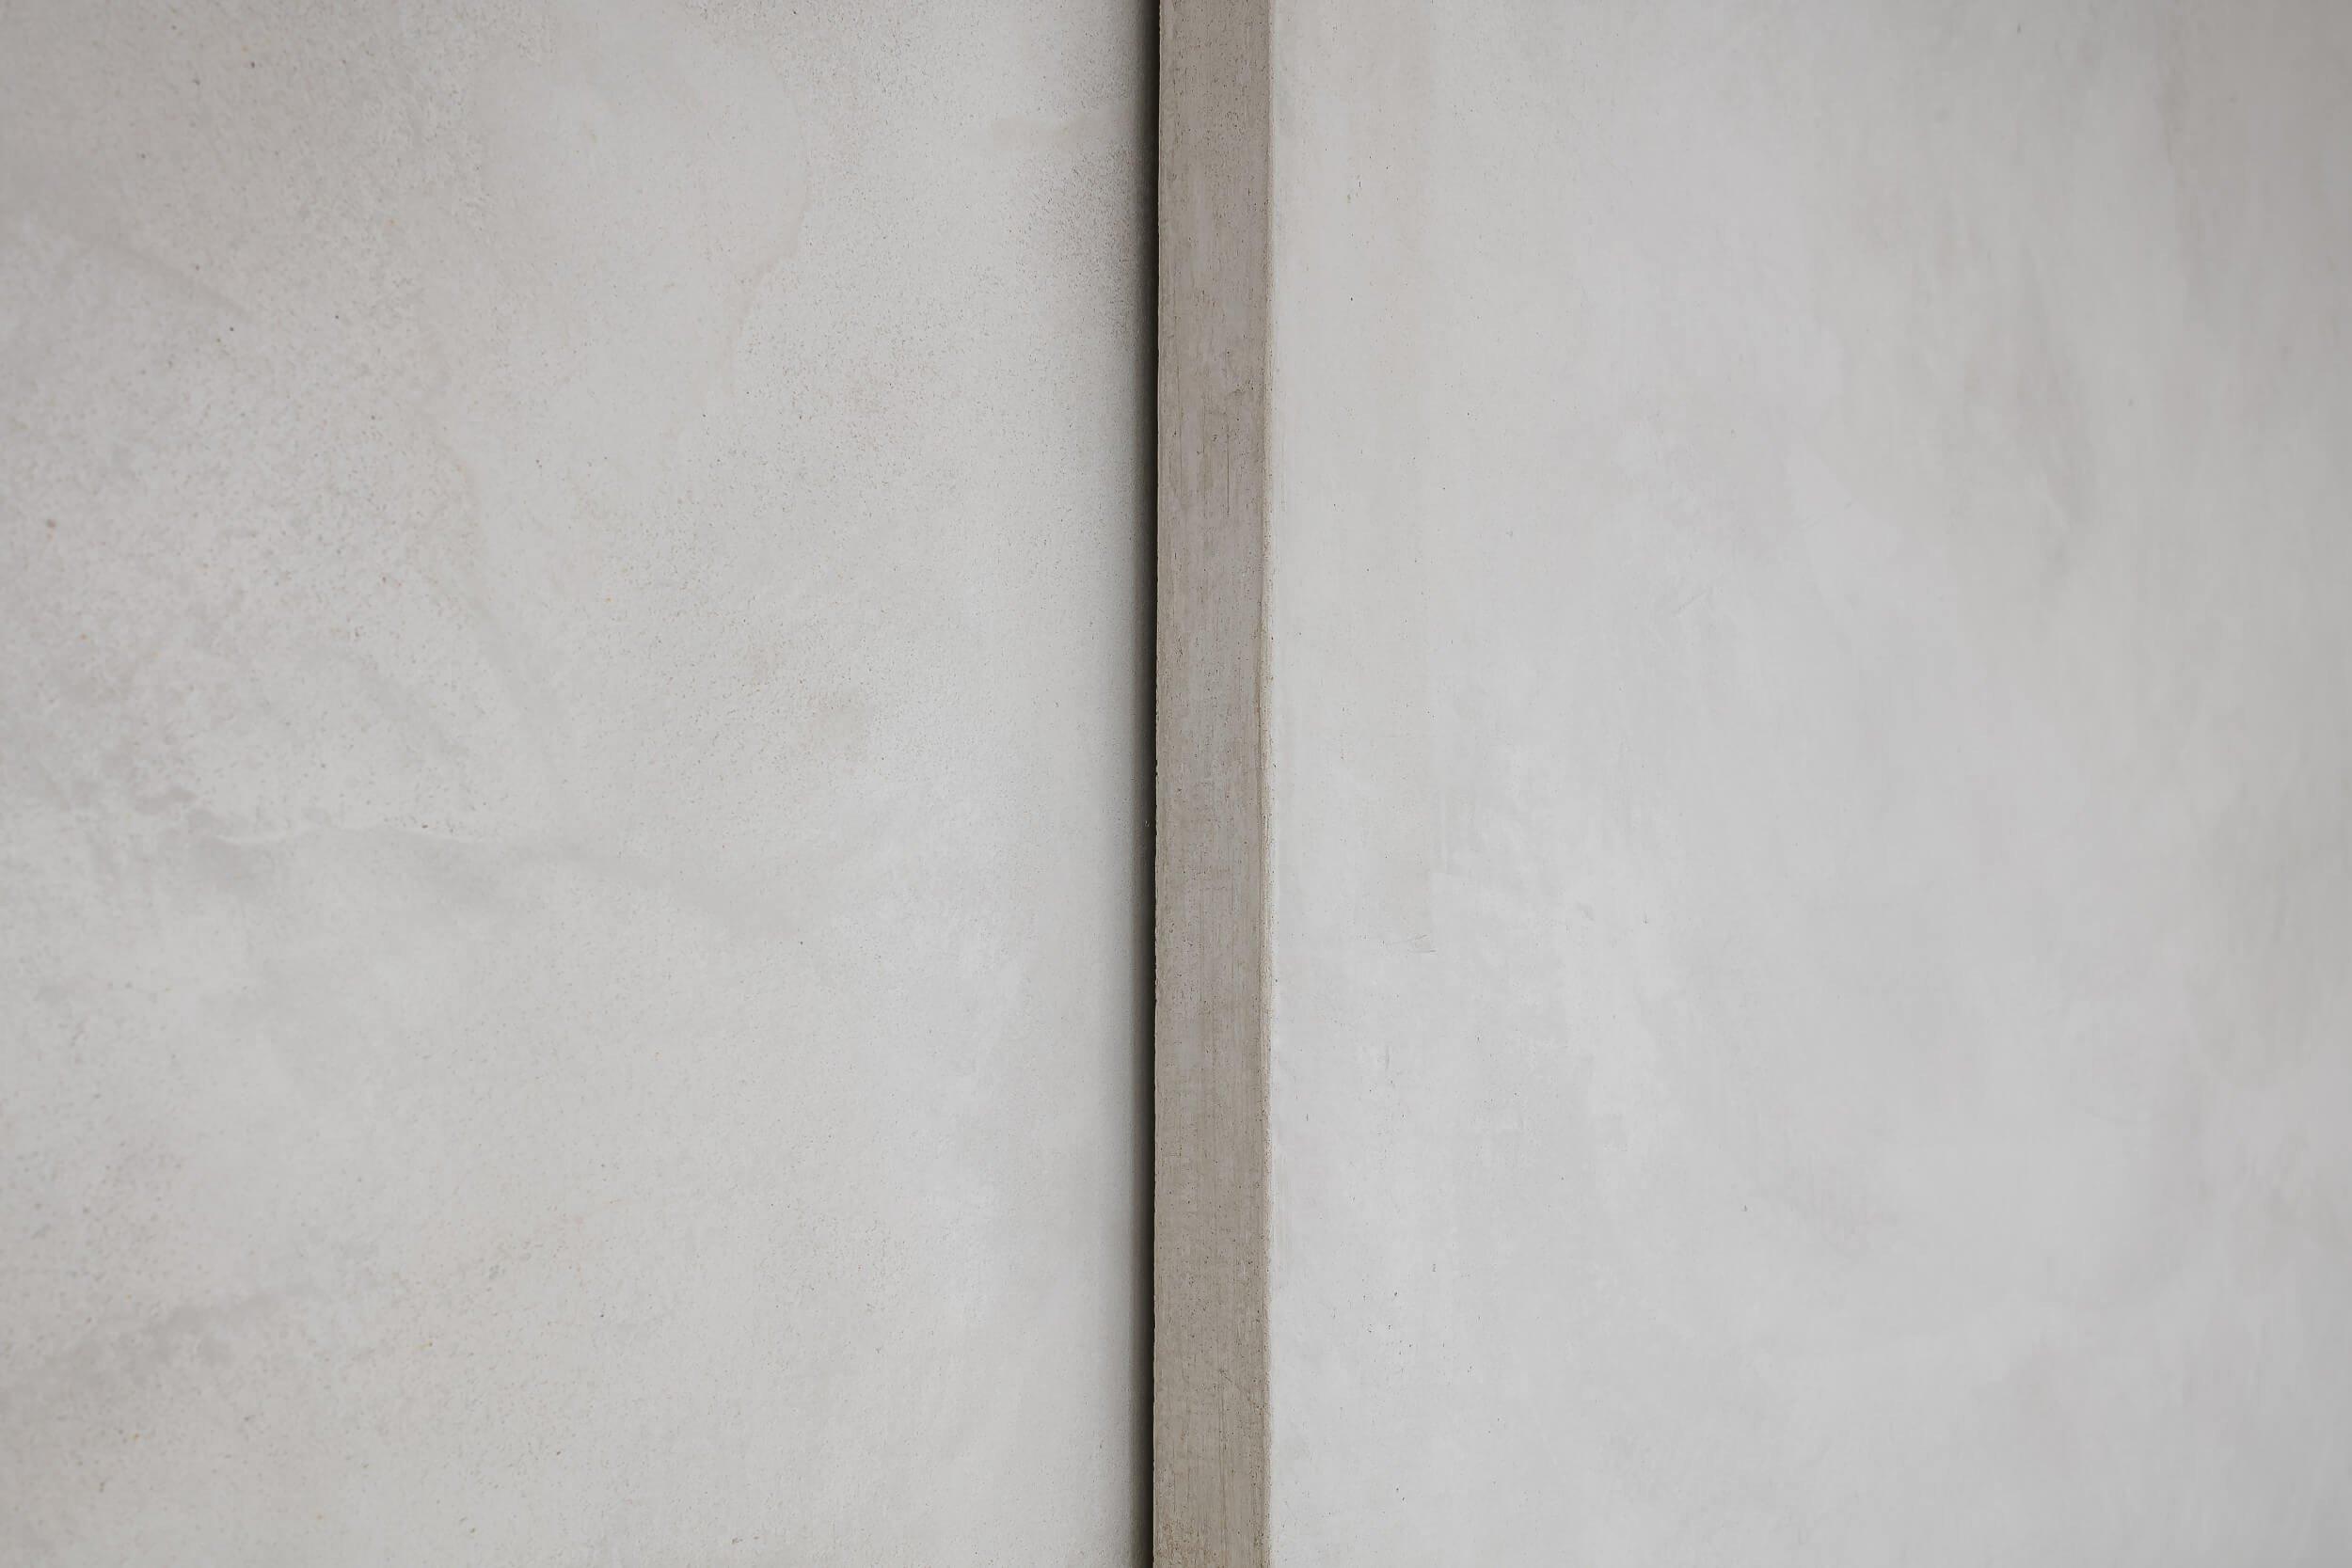 Rietveldprojects.be-five-am-rrr-odilon-creations-photobycafeine19.jpg